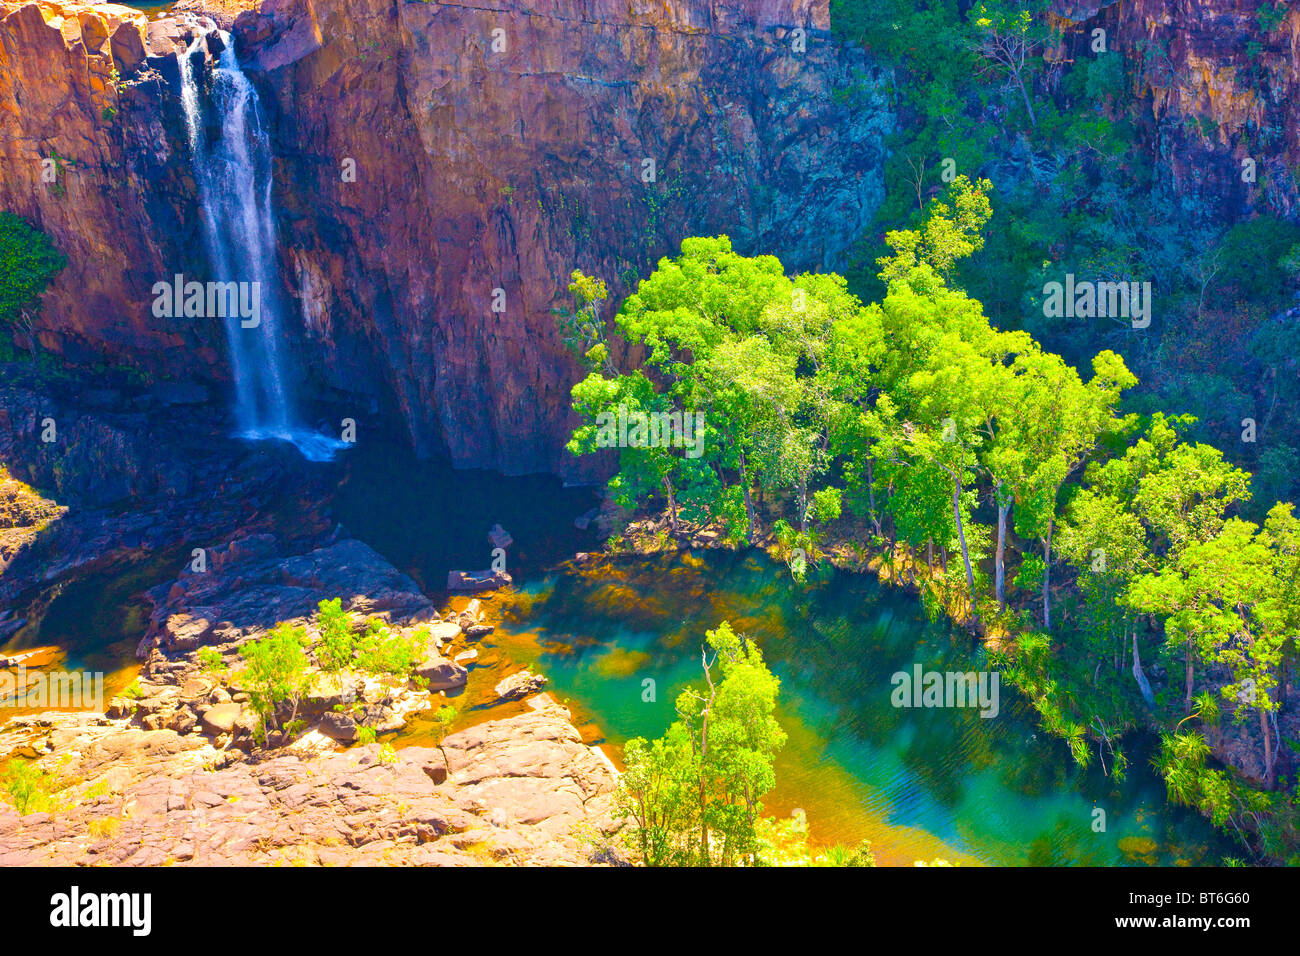 Waterfall, Nitmiluk National Park, Australia, falls from Arhemland Escarpment, Northern Territory, Eucalyptus (gum) - Stock Image